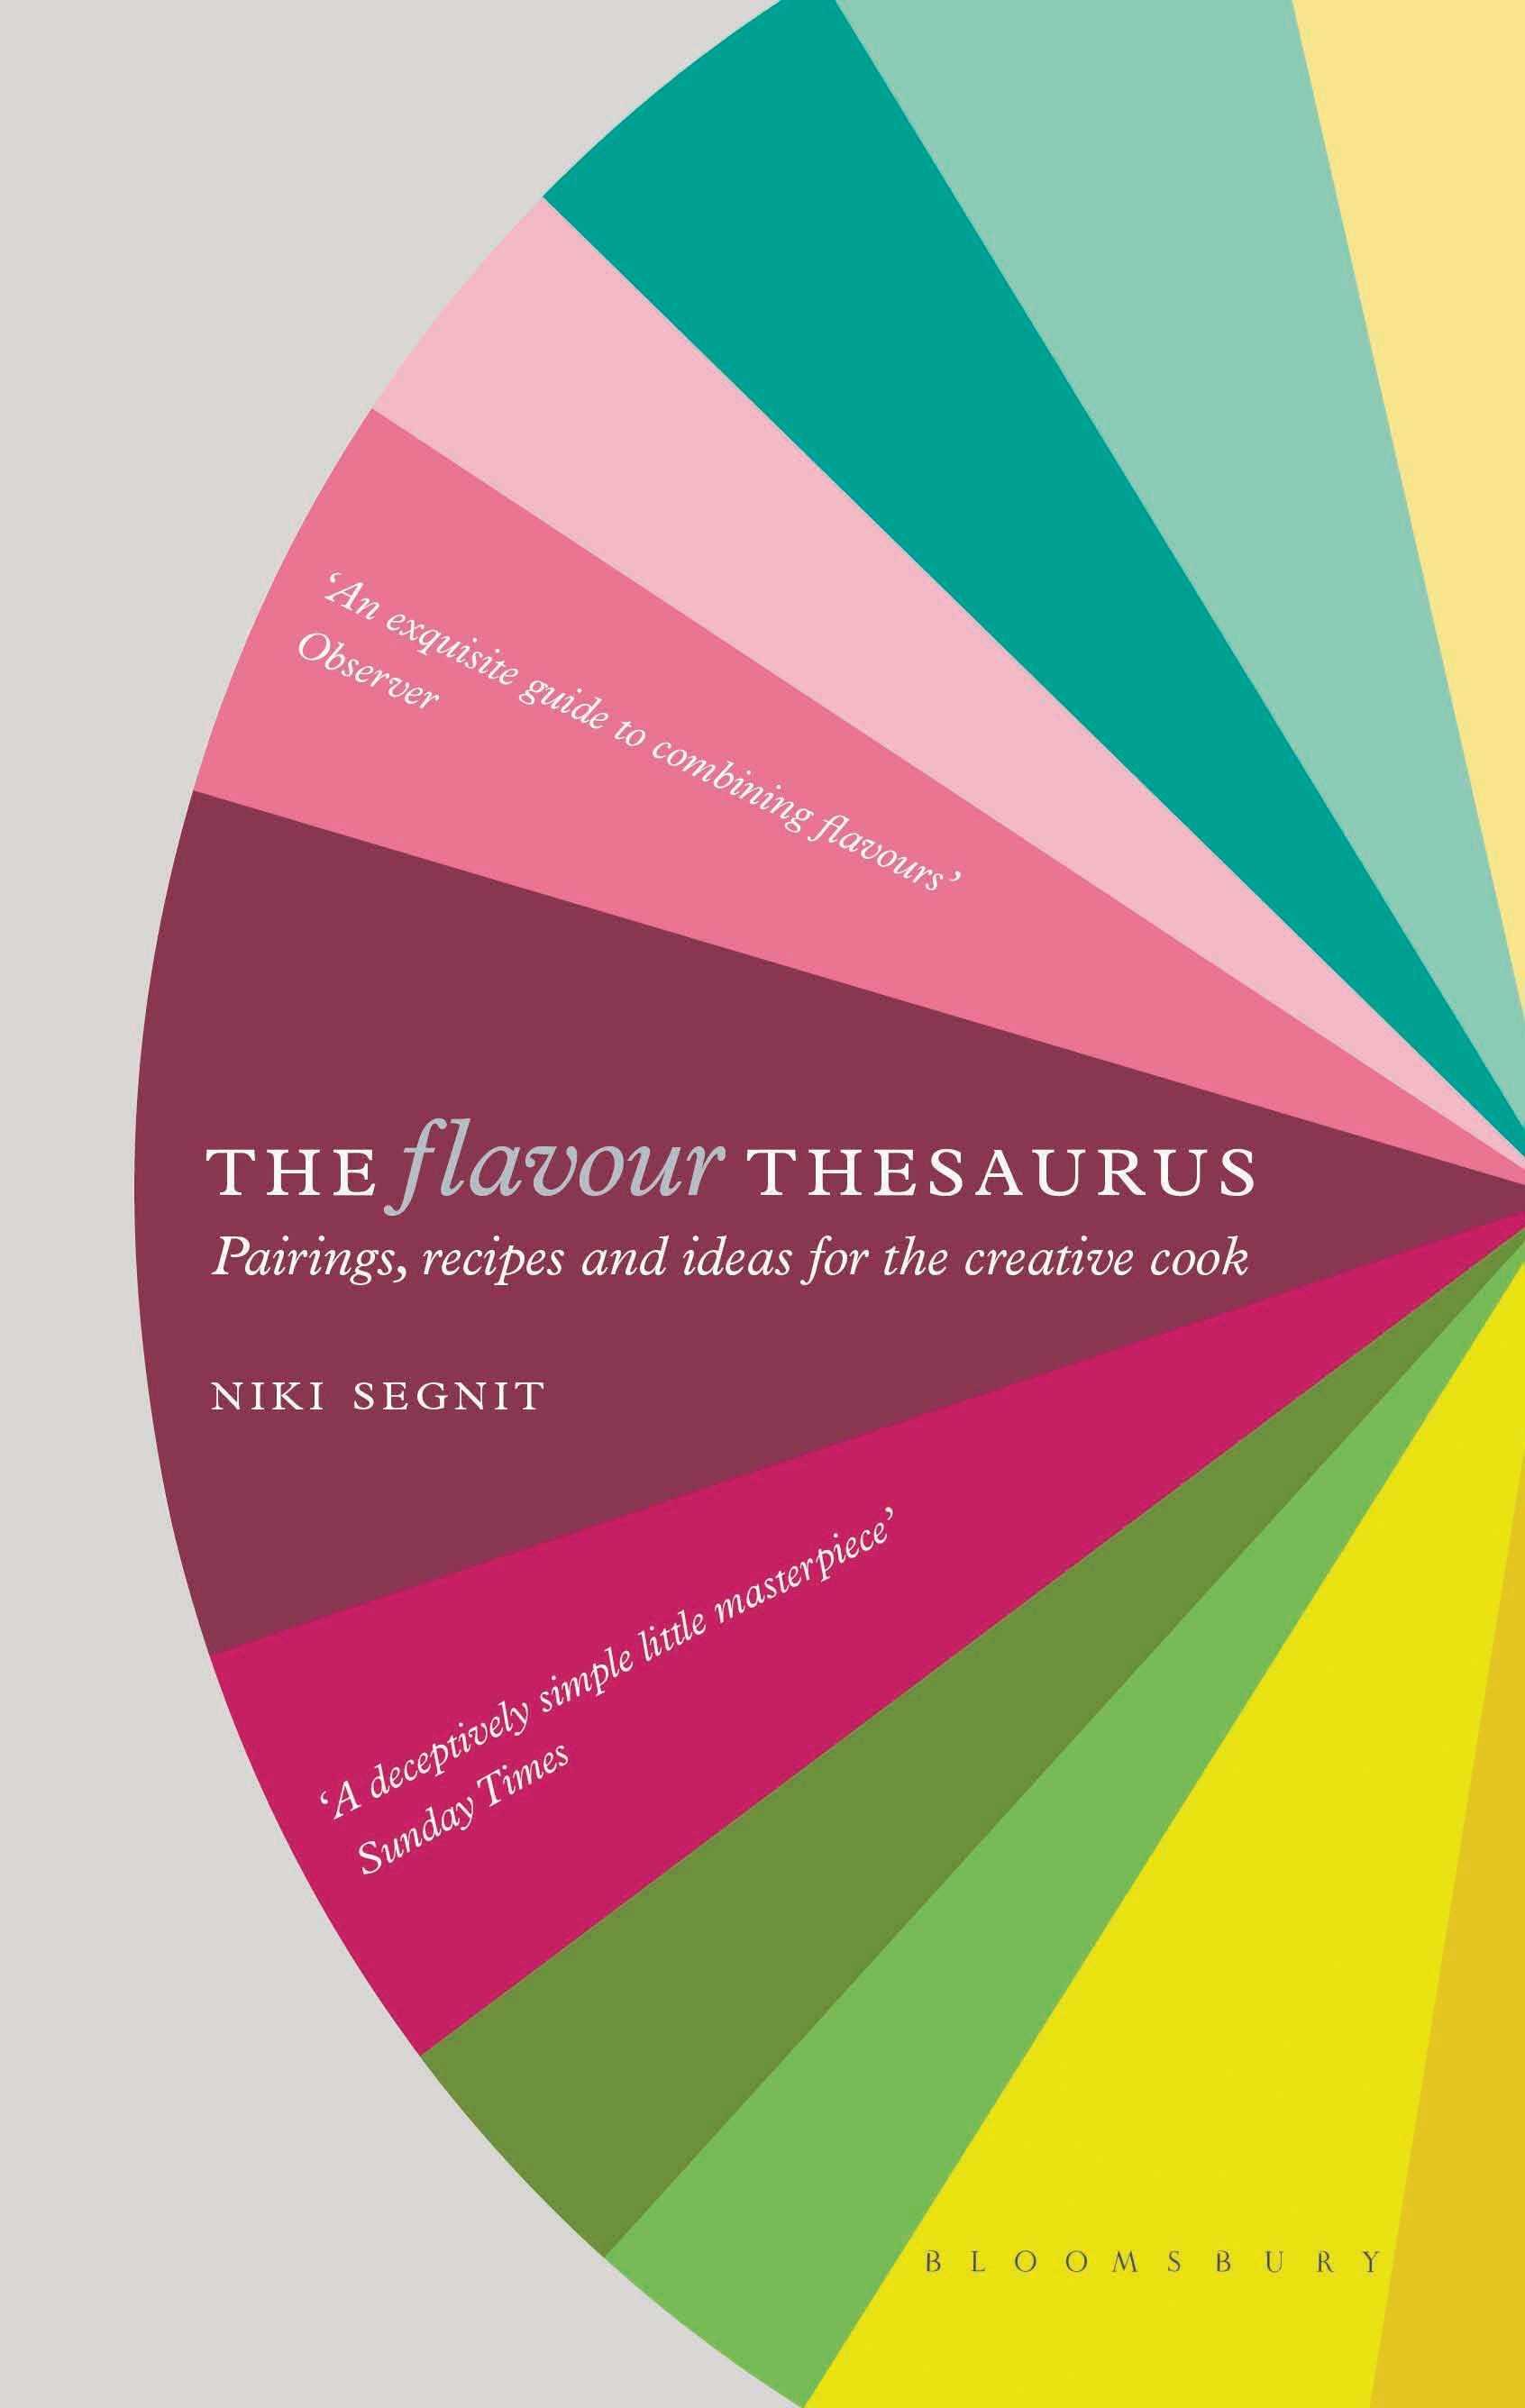 The Flavour Thesaurus Niki Segnit (Bloomsbury, £18.99)